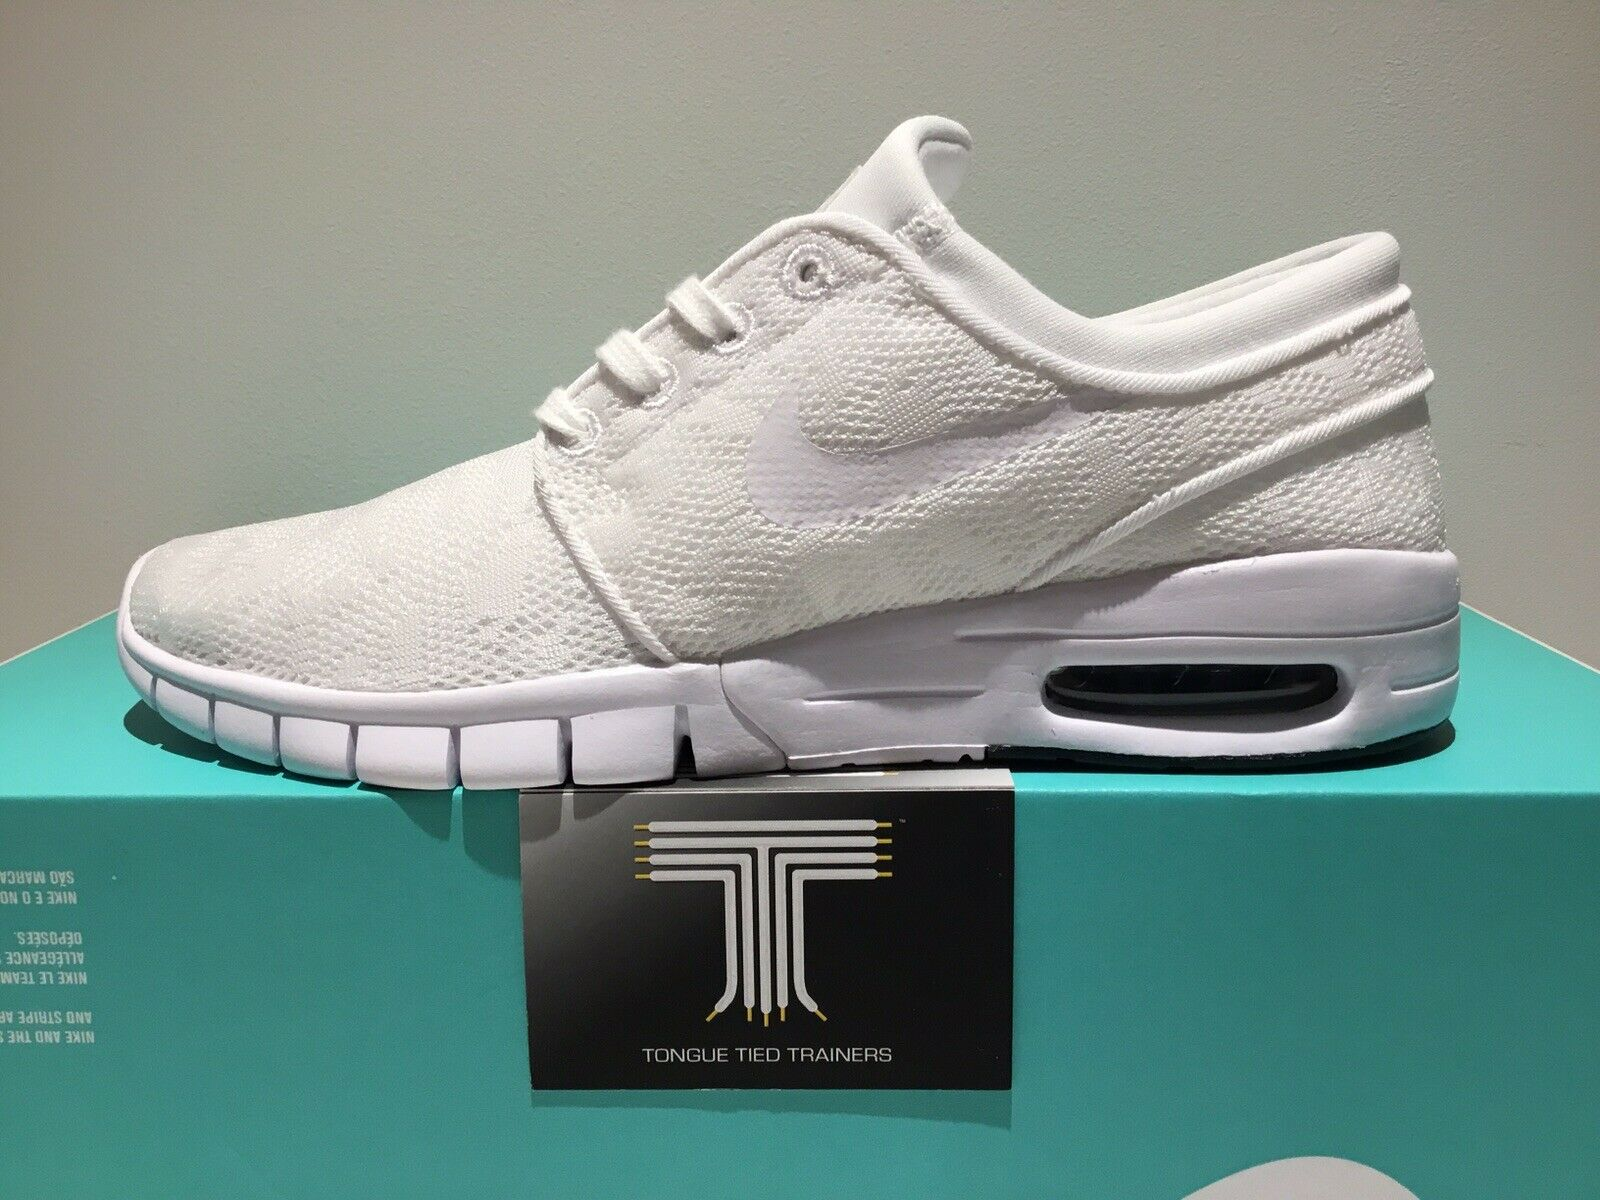 Nike Air Stefan Janoski Max  631303 114  Uk Size 13